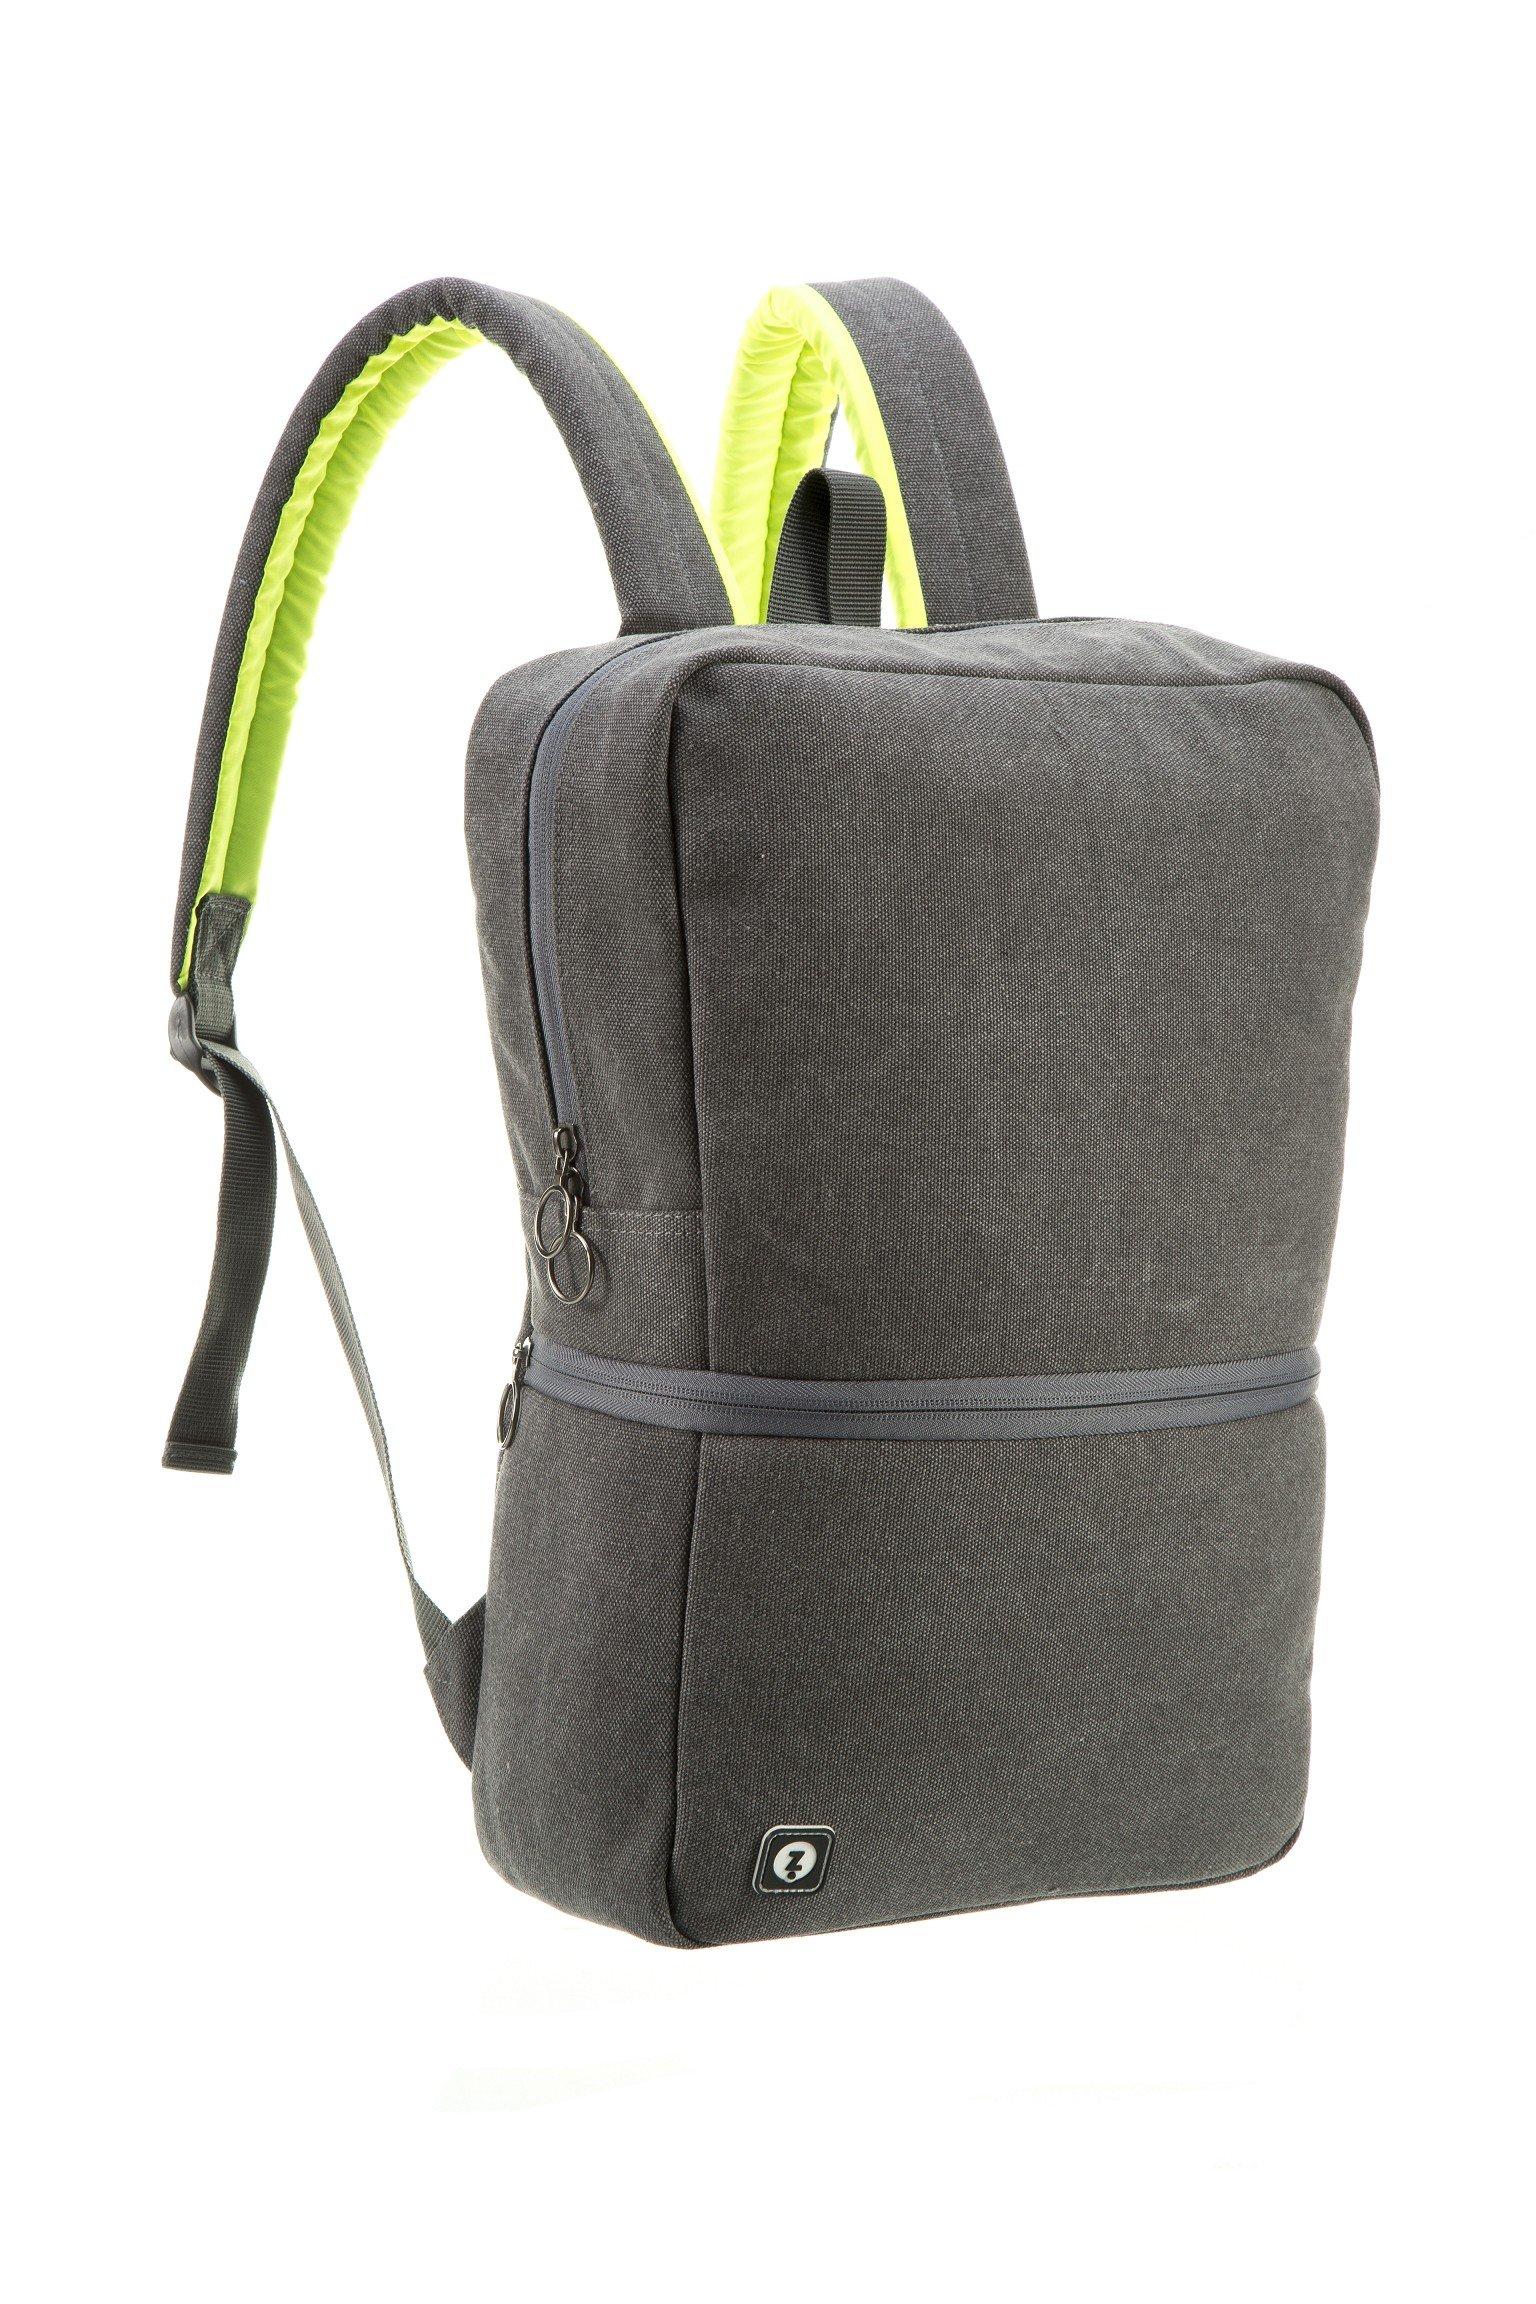 ZIPIT Reflecto Student Backpack